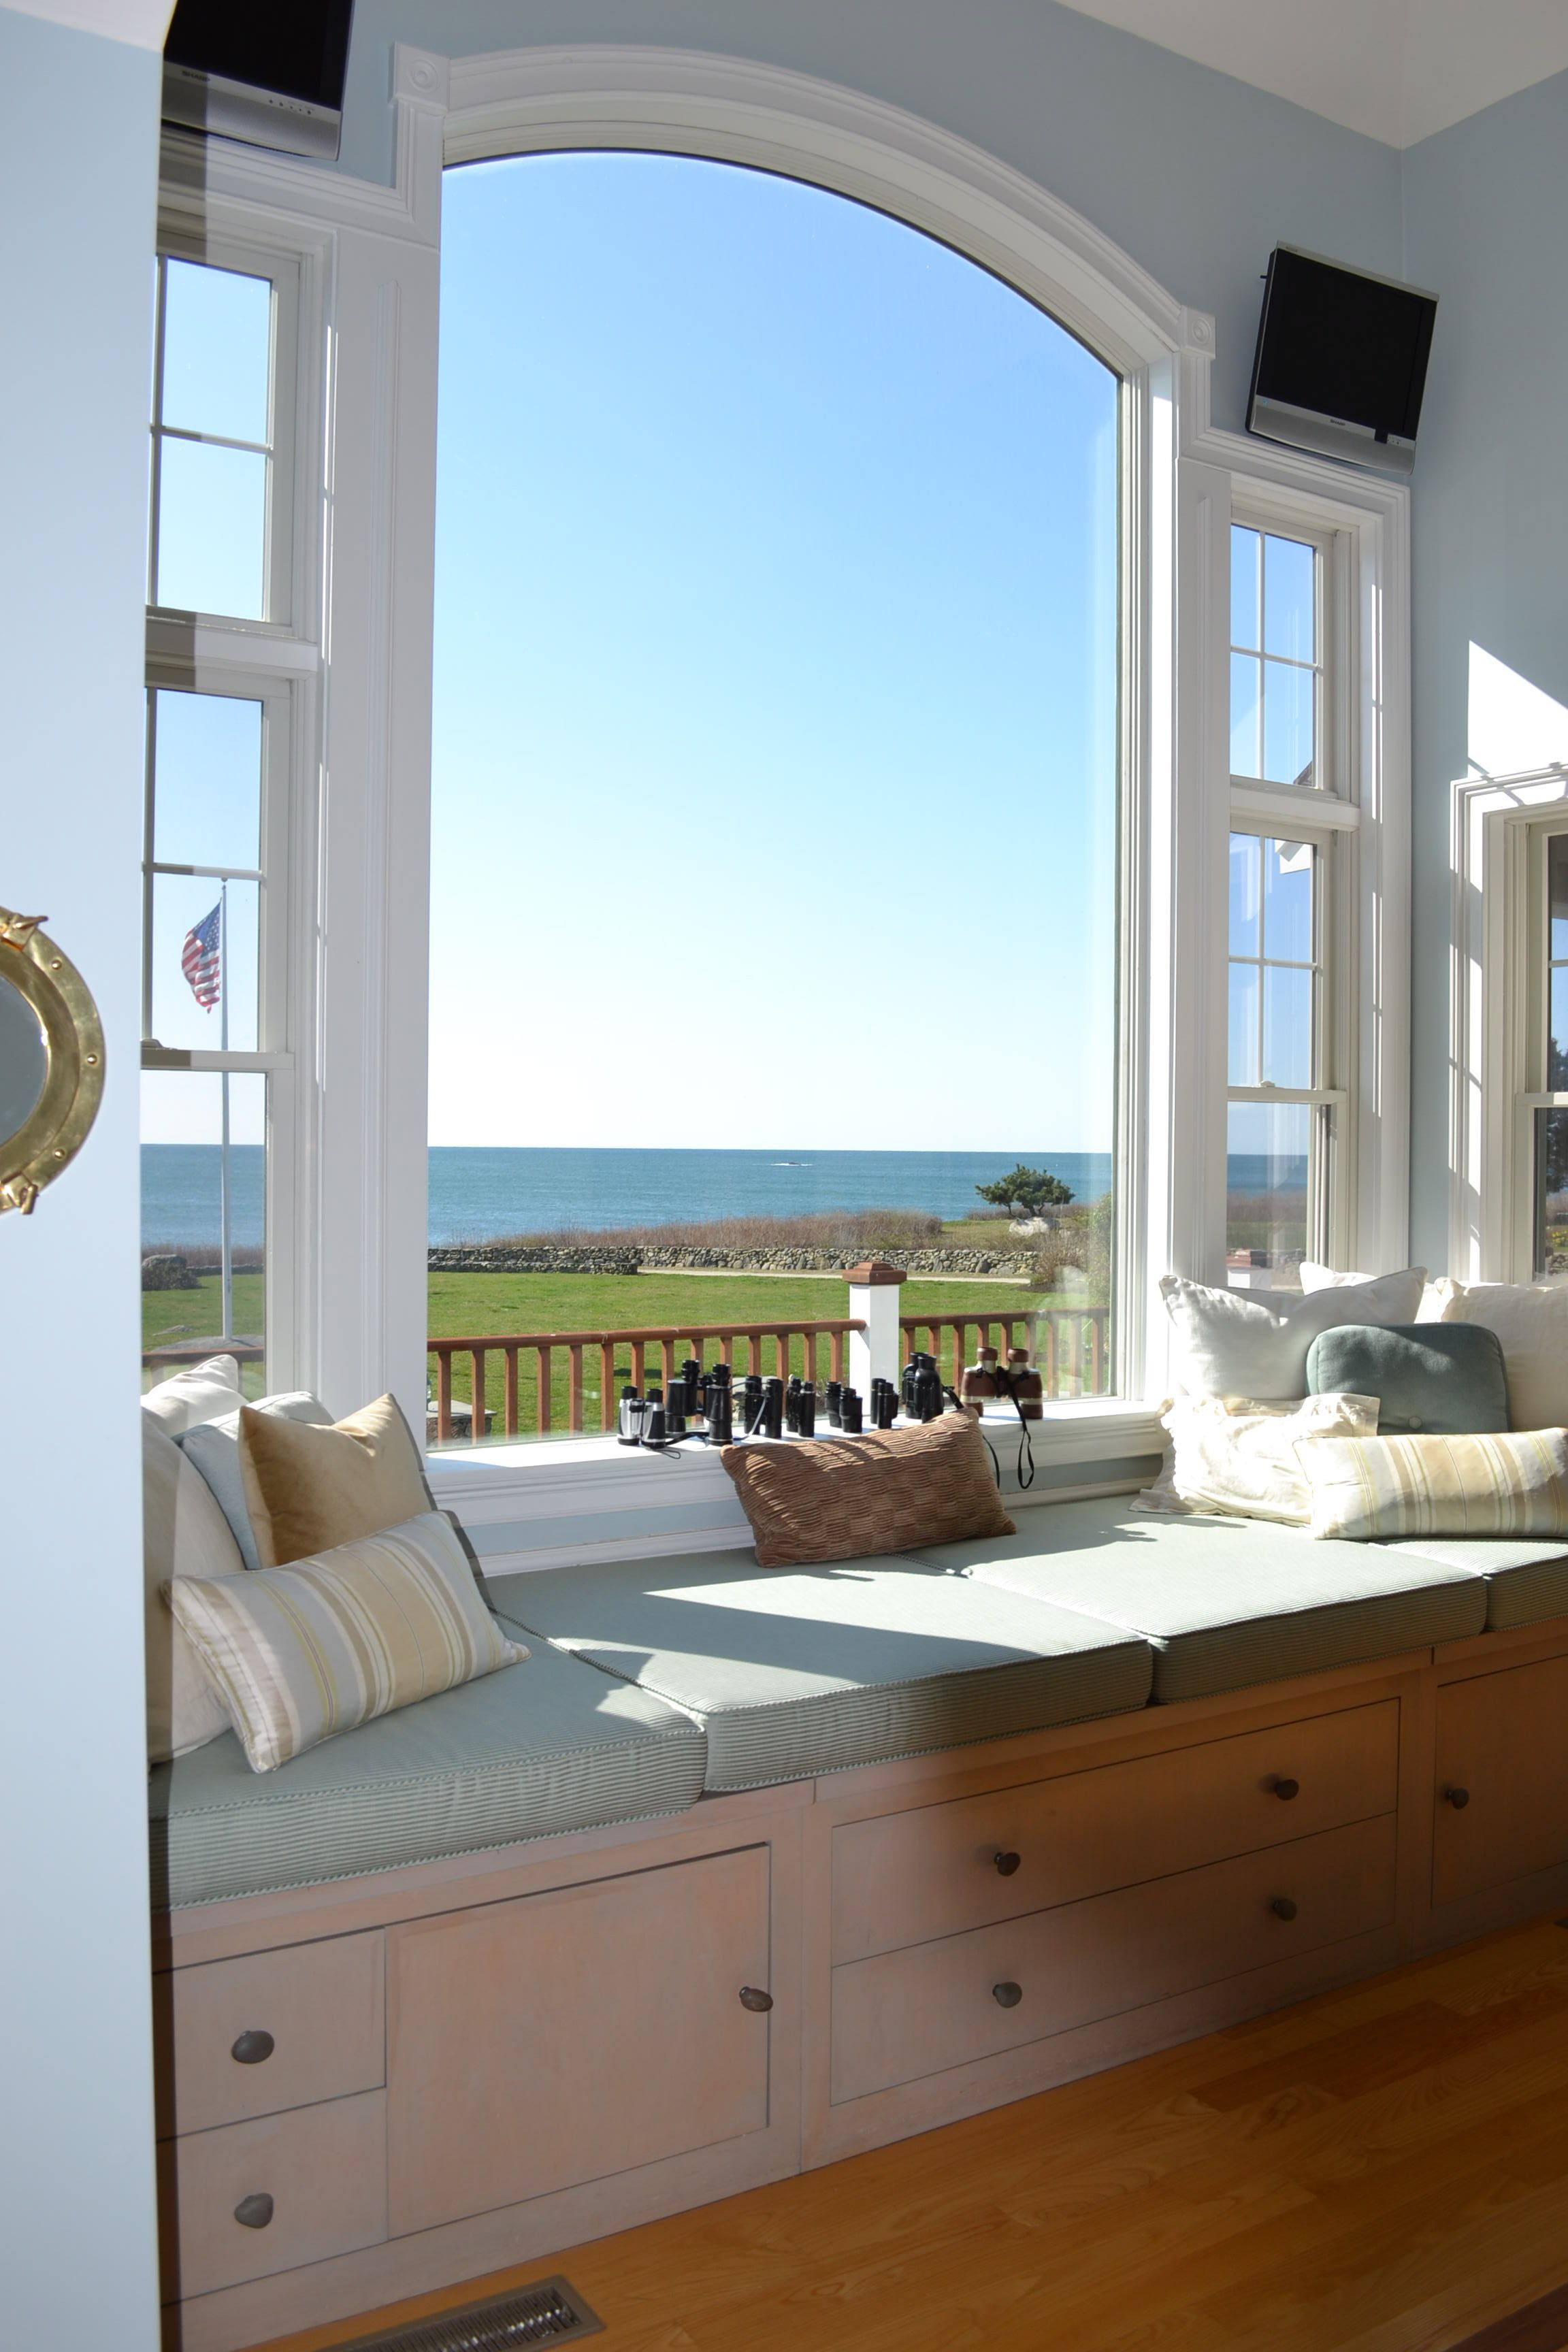 Gorgeous Window and Window Bench... 44 Beach Drive Little Compton, RI